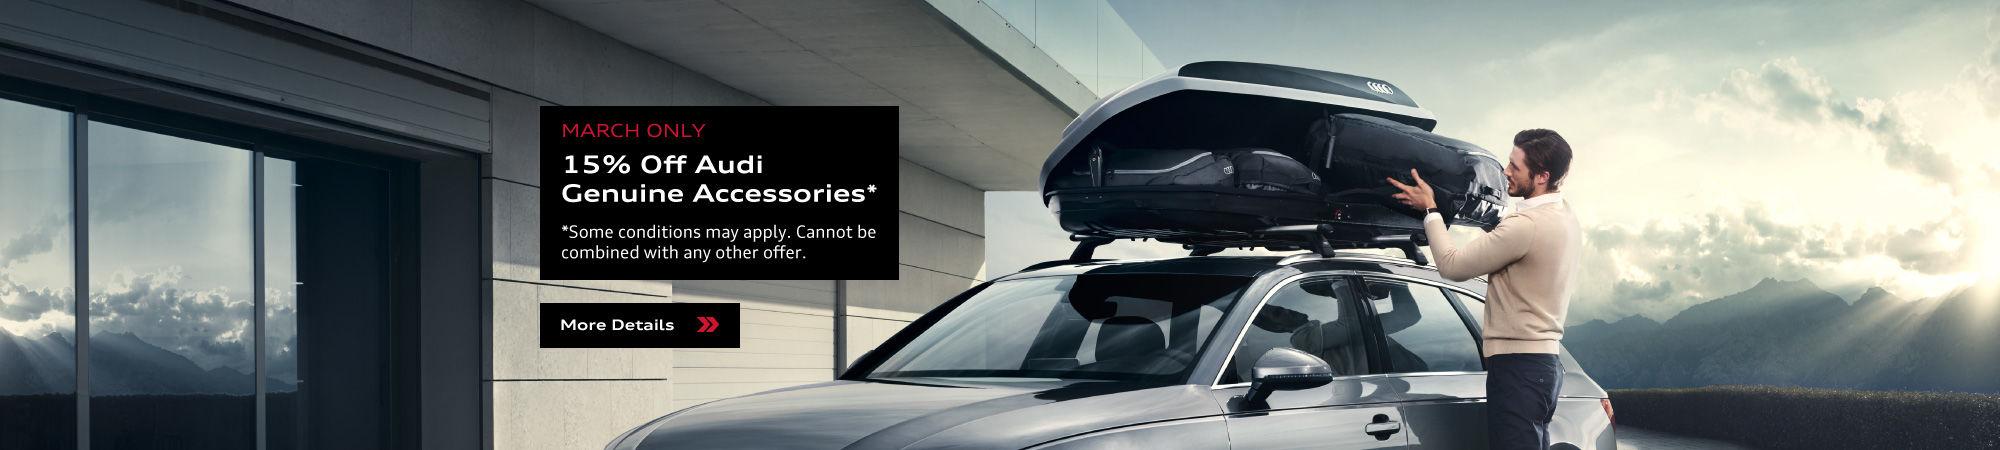 15% Off Audi Genuine Accessories